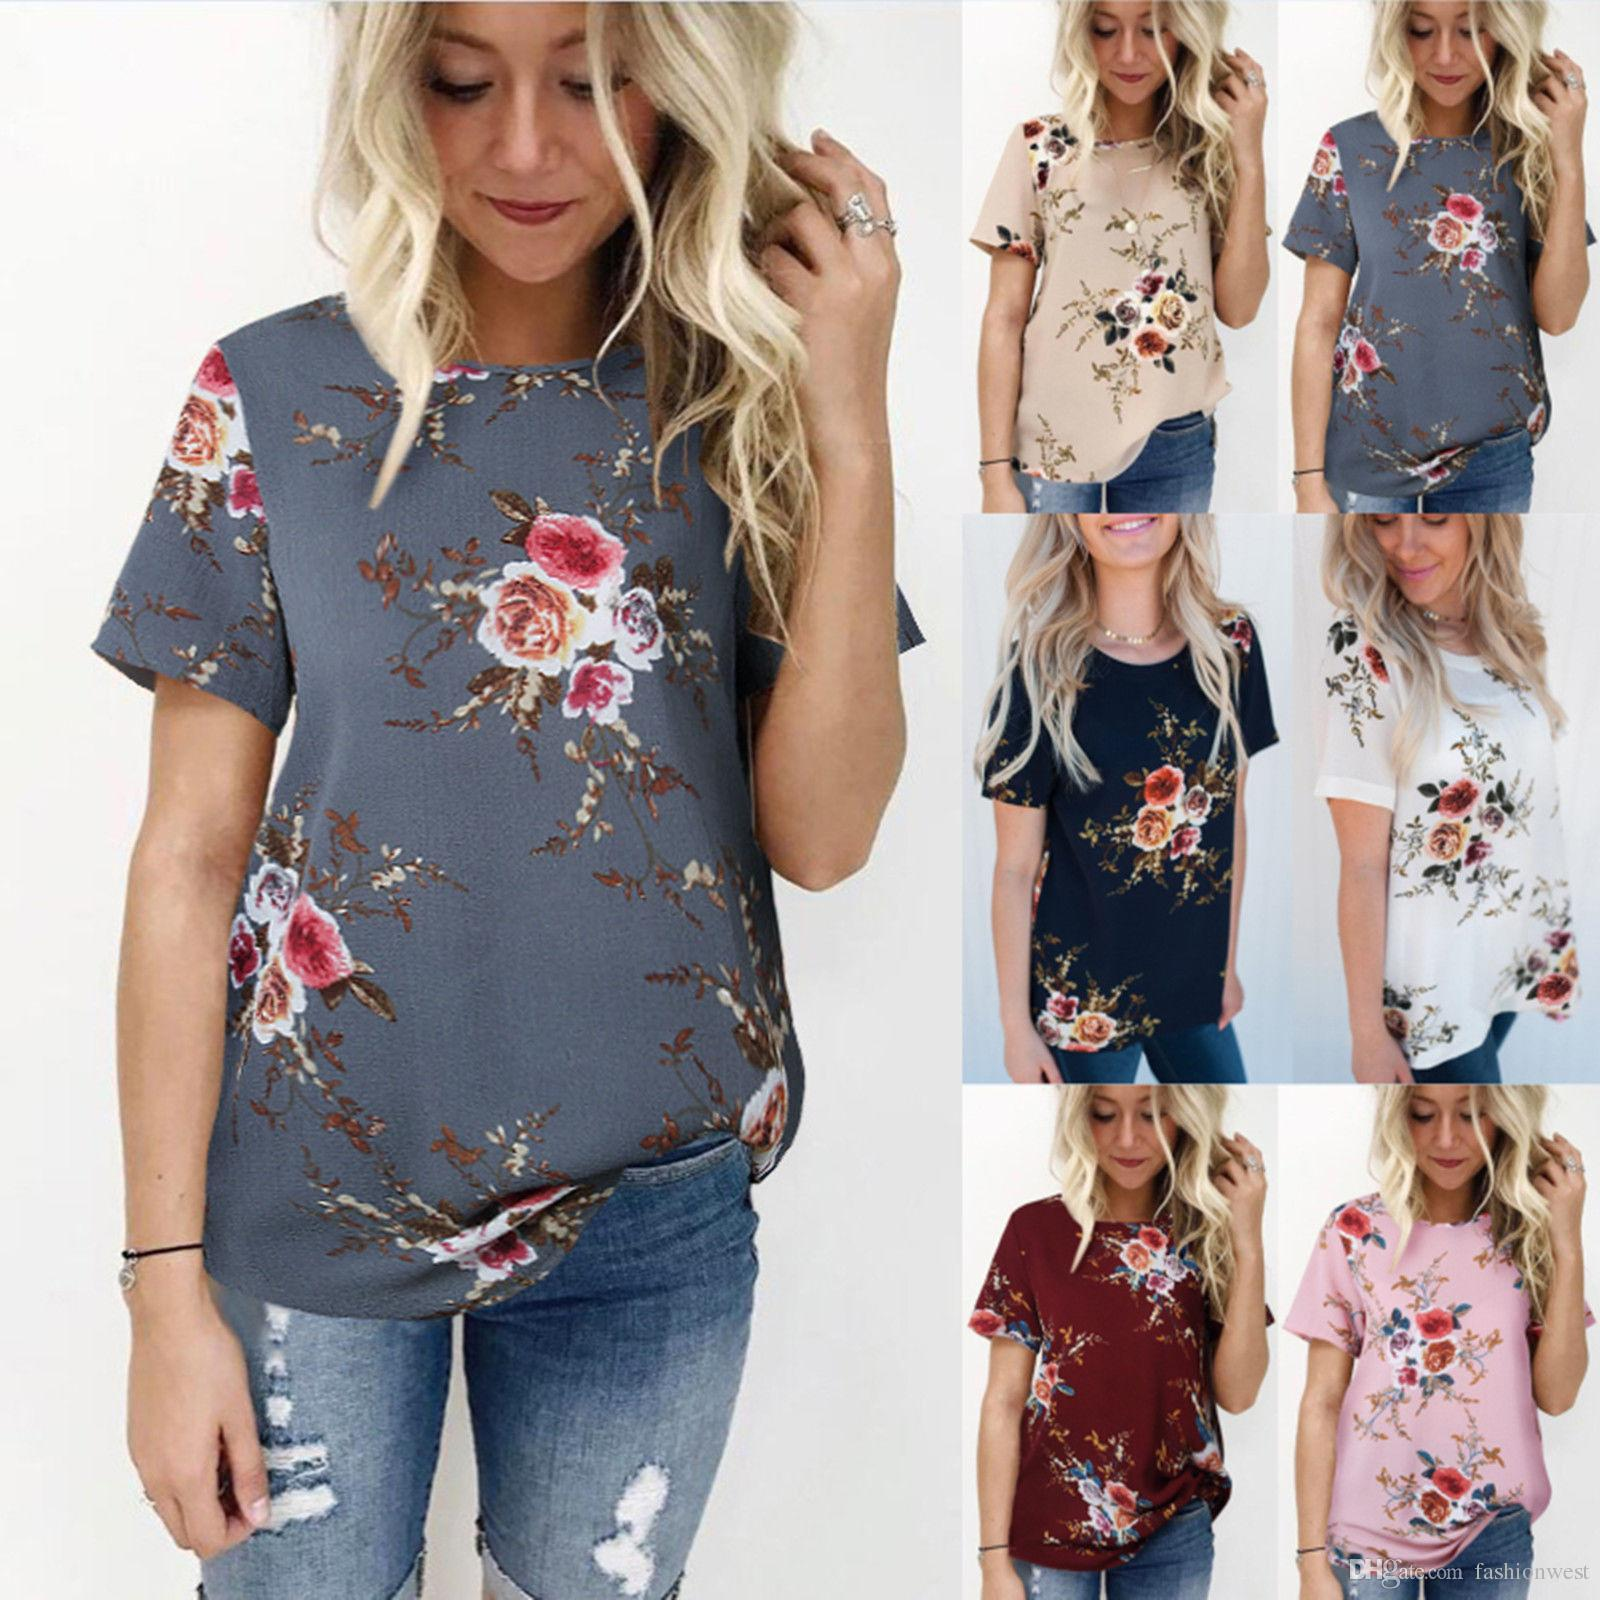 c47adfff 2019 Summer Womens Floral Tops Blouse Ladies Short Sleeve T Shirt Plus Size  6 20 Best T Shirt Shop Online Cool T Shirt Online From Wuxingliuhe, ...